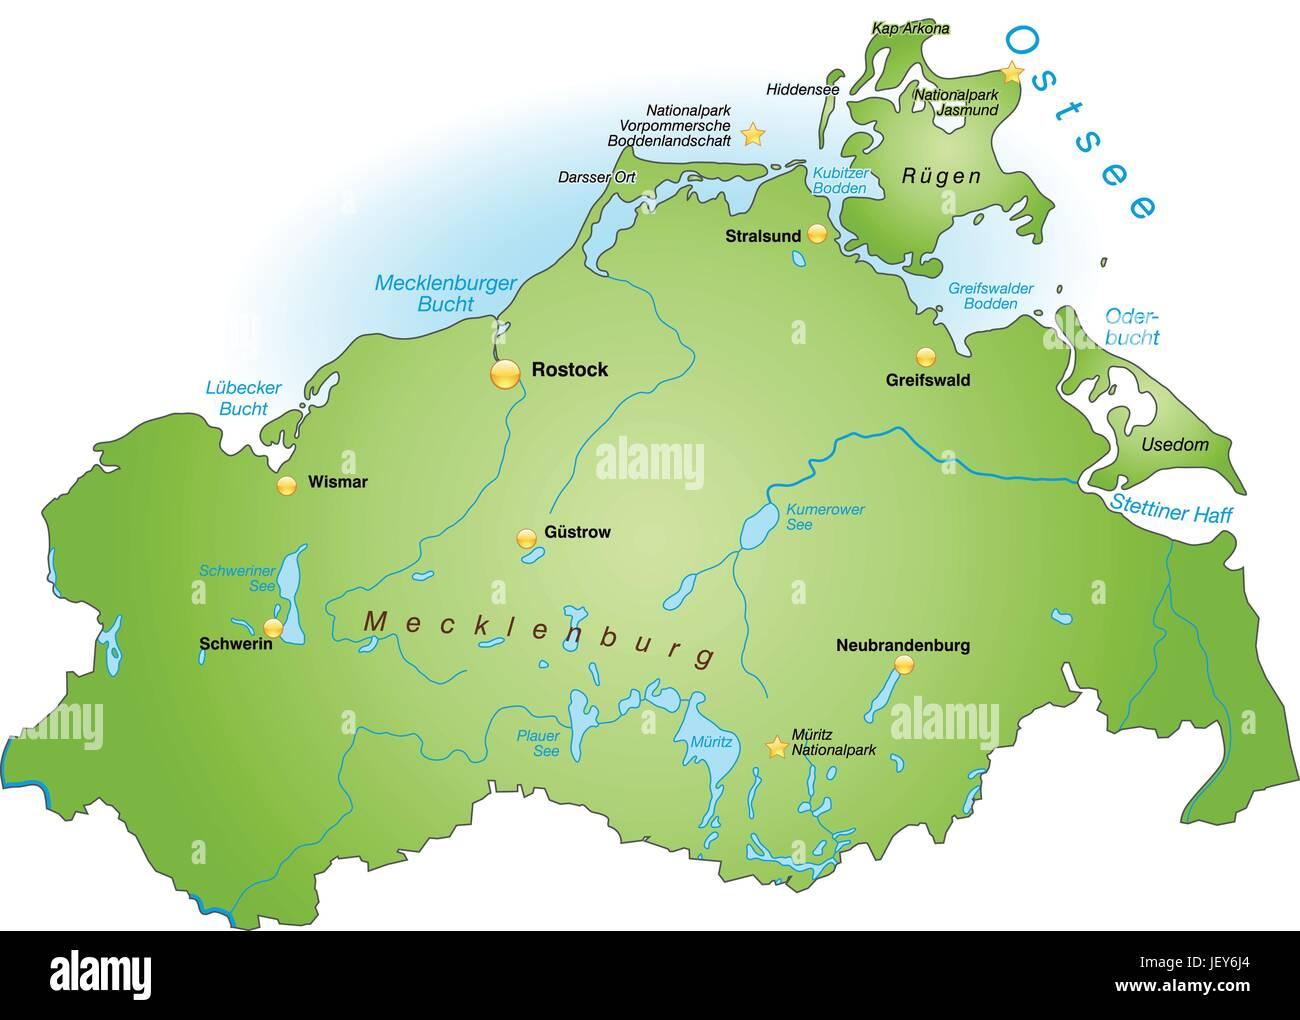 Mecklenburg card western state atlas map of the world map mecklenburg card western state atlas map of the world map gumiabroncs Choice Image